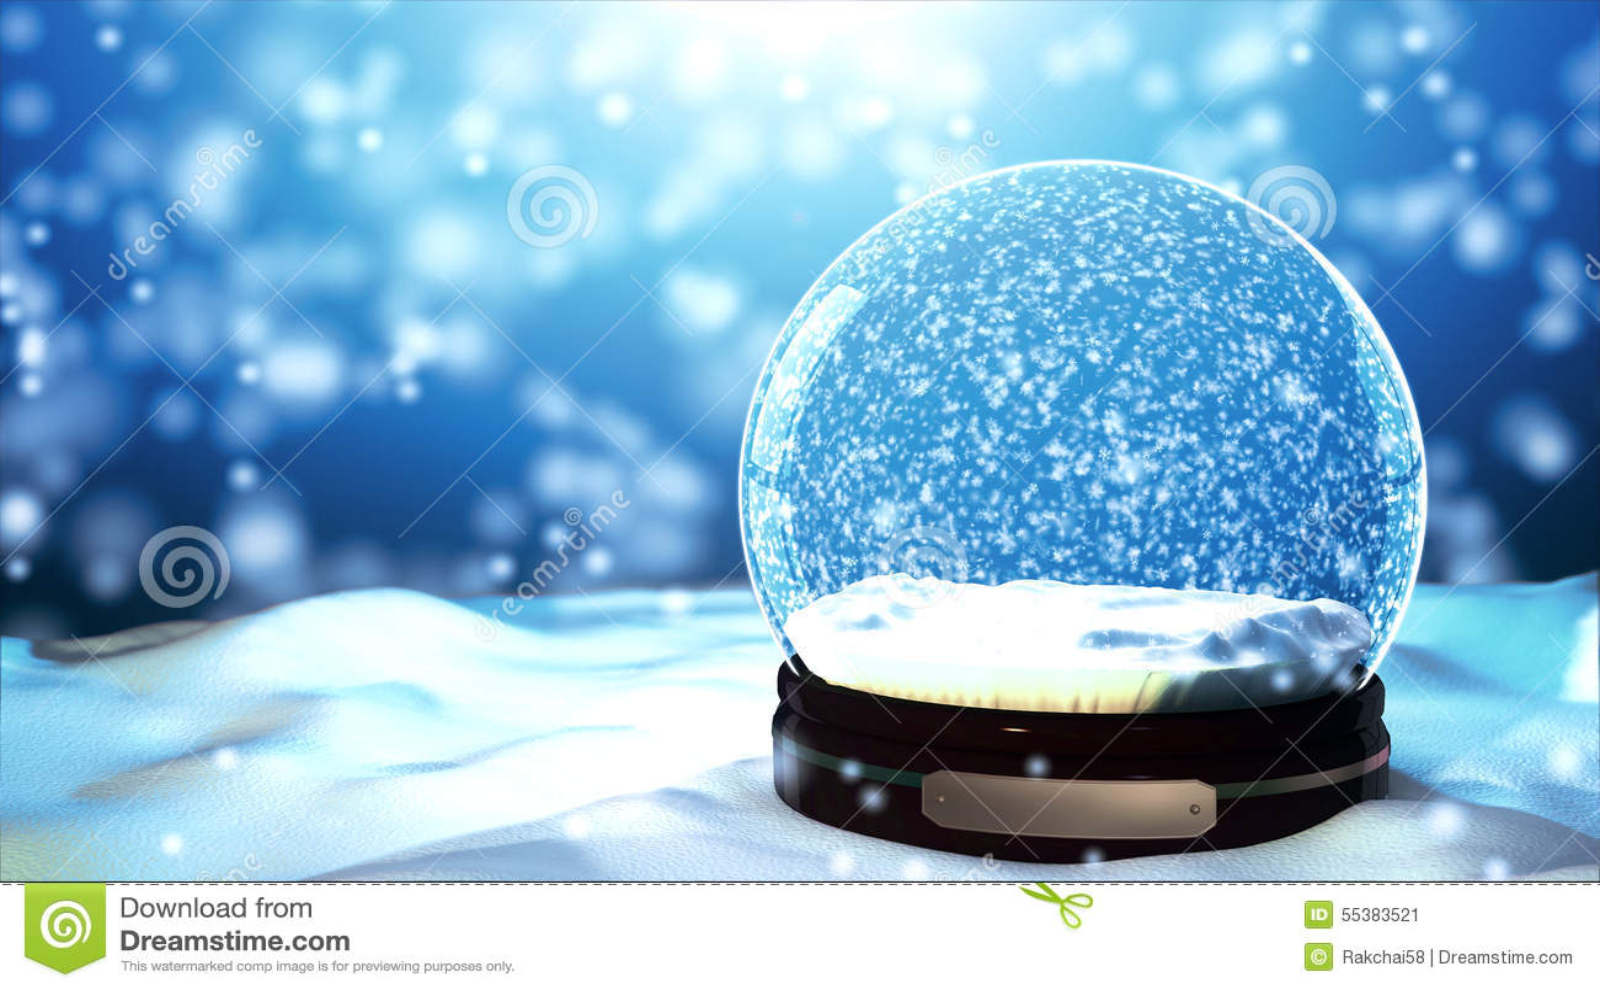 Christmas Snow globe Snowflake with Snowfall on Blue Background